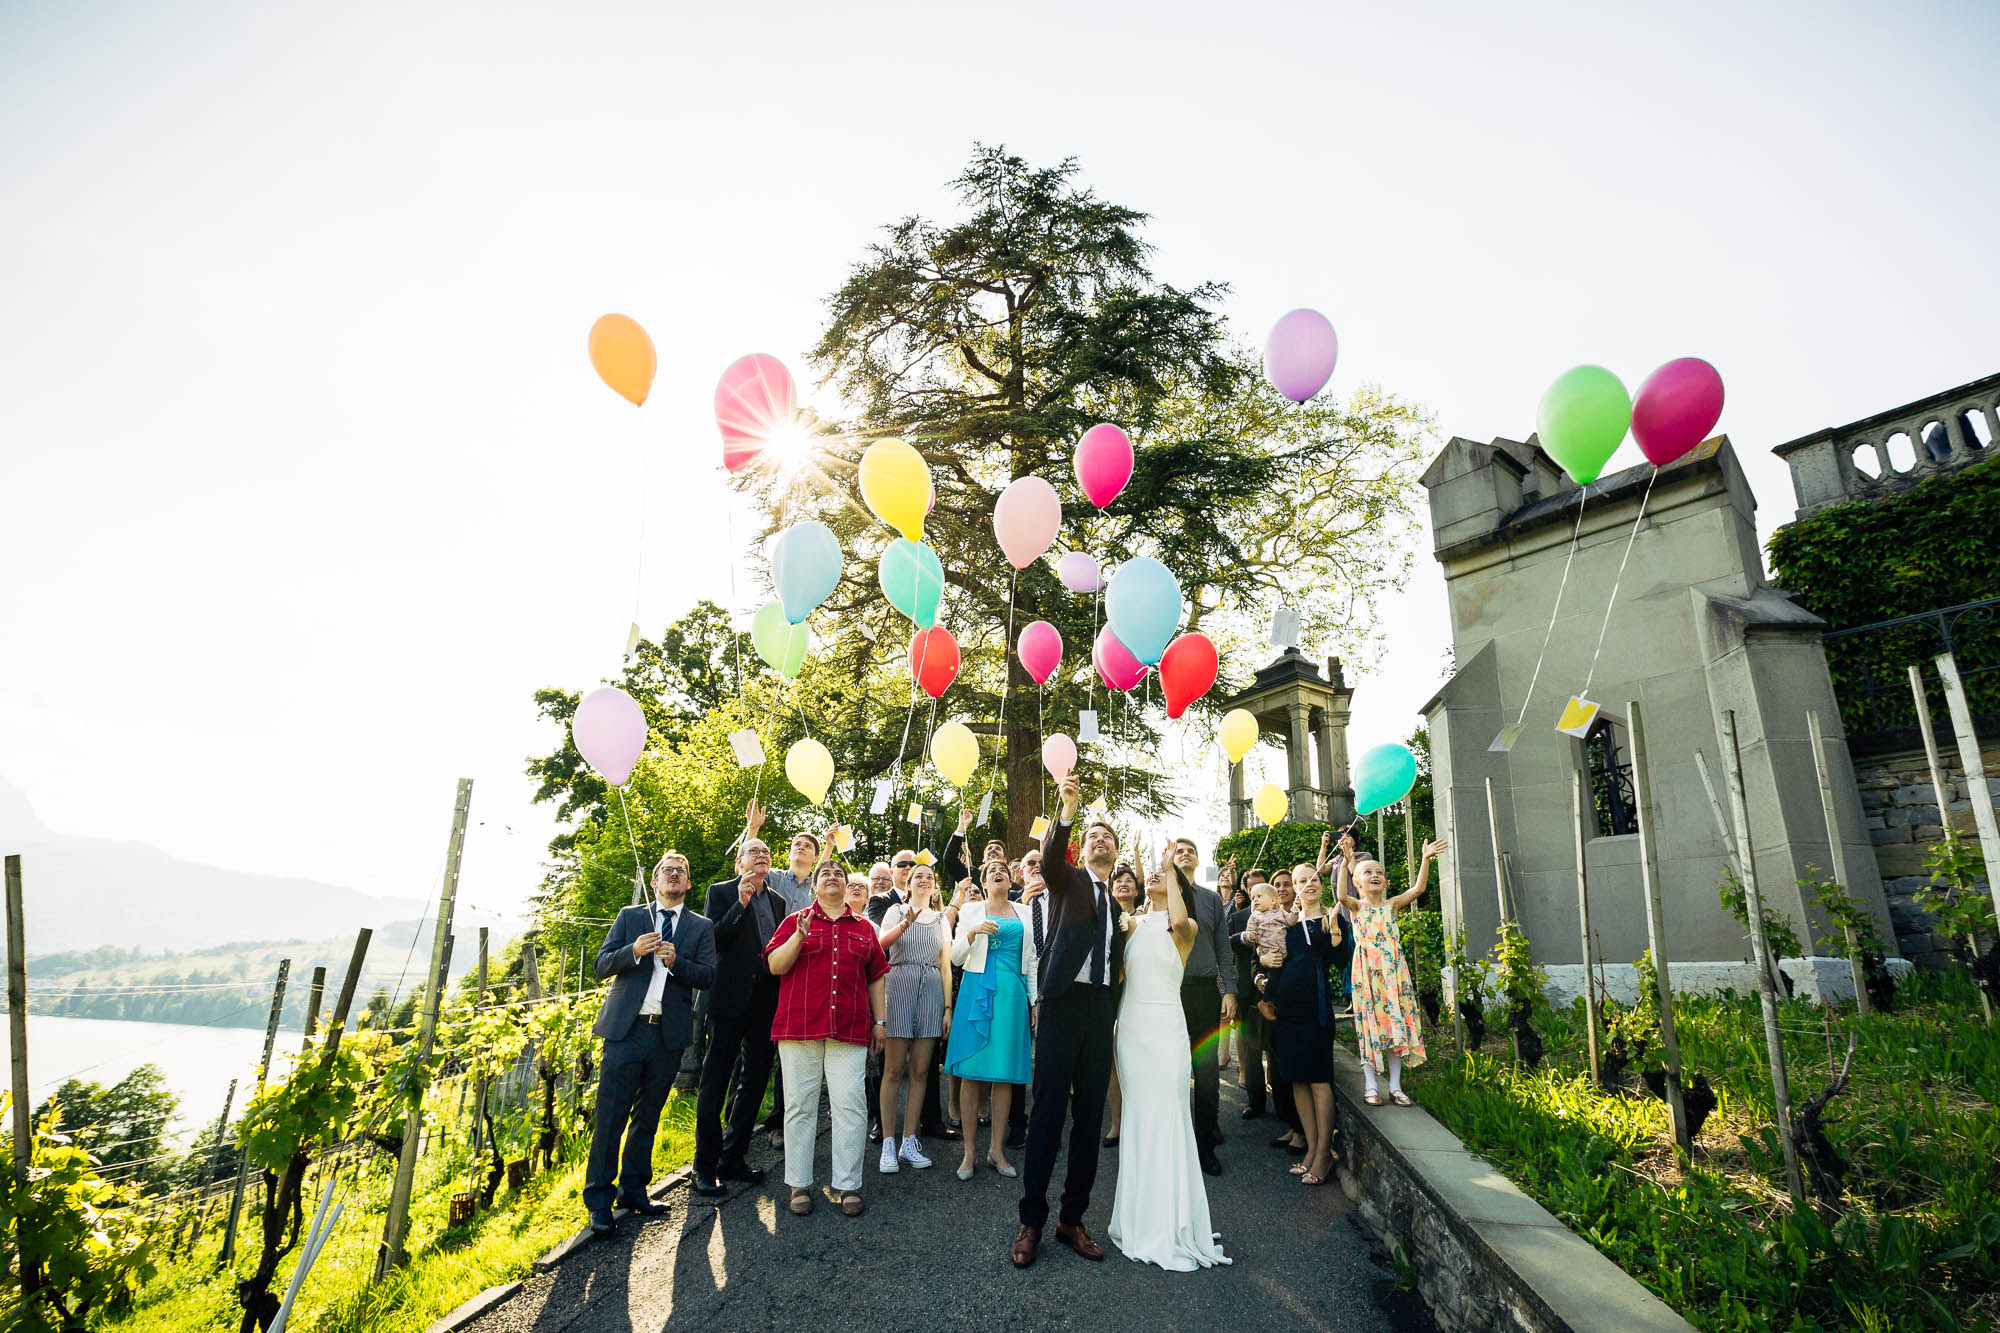 Brautpaar lässt farbige Luftballone steigen